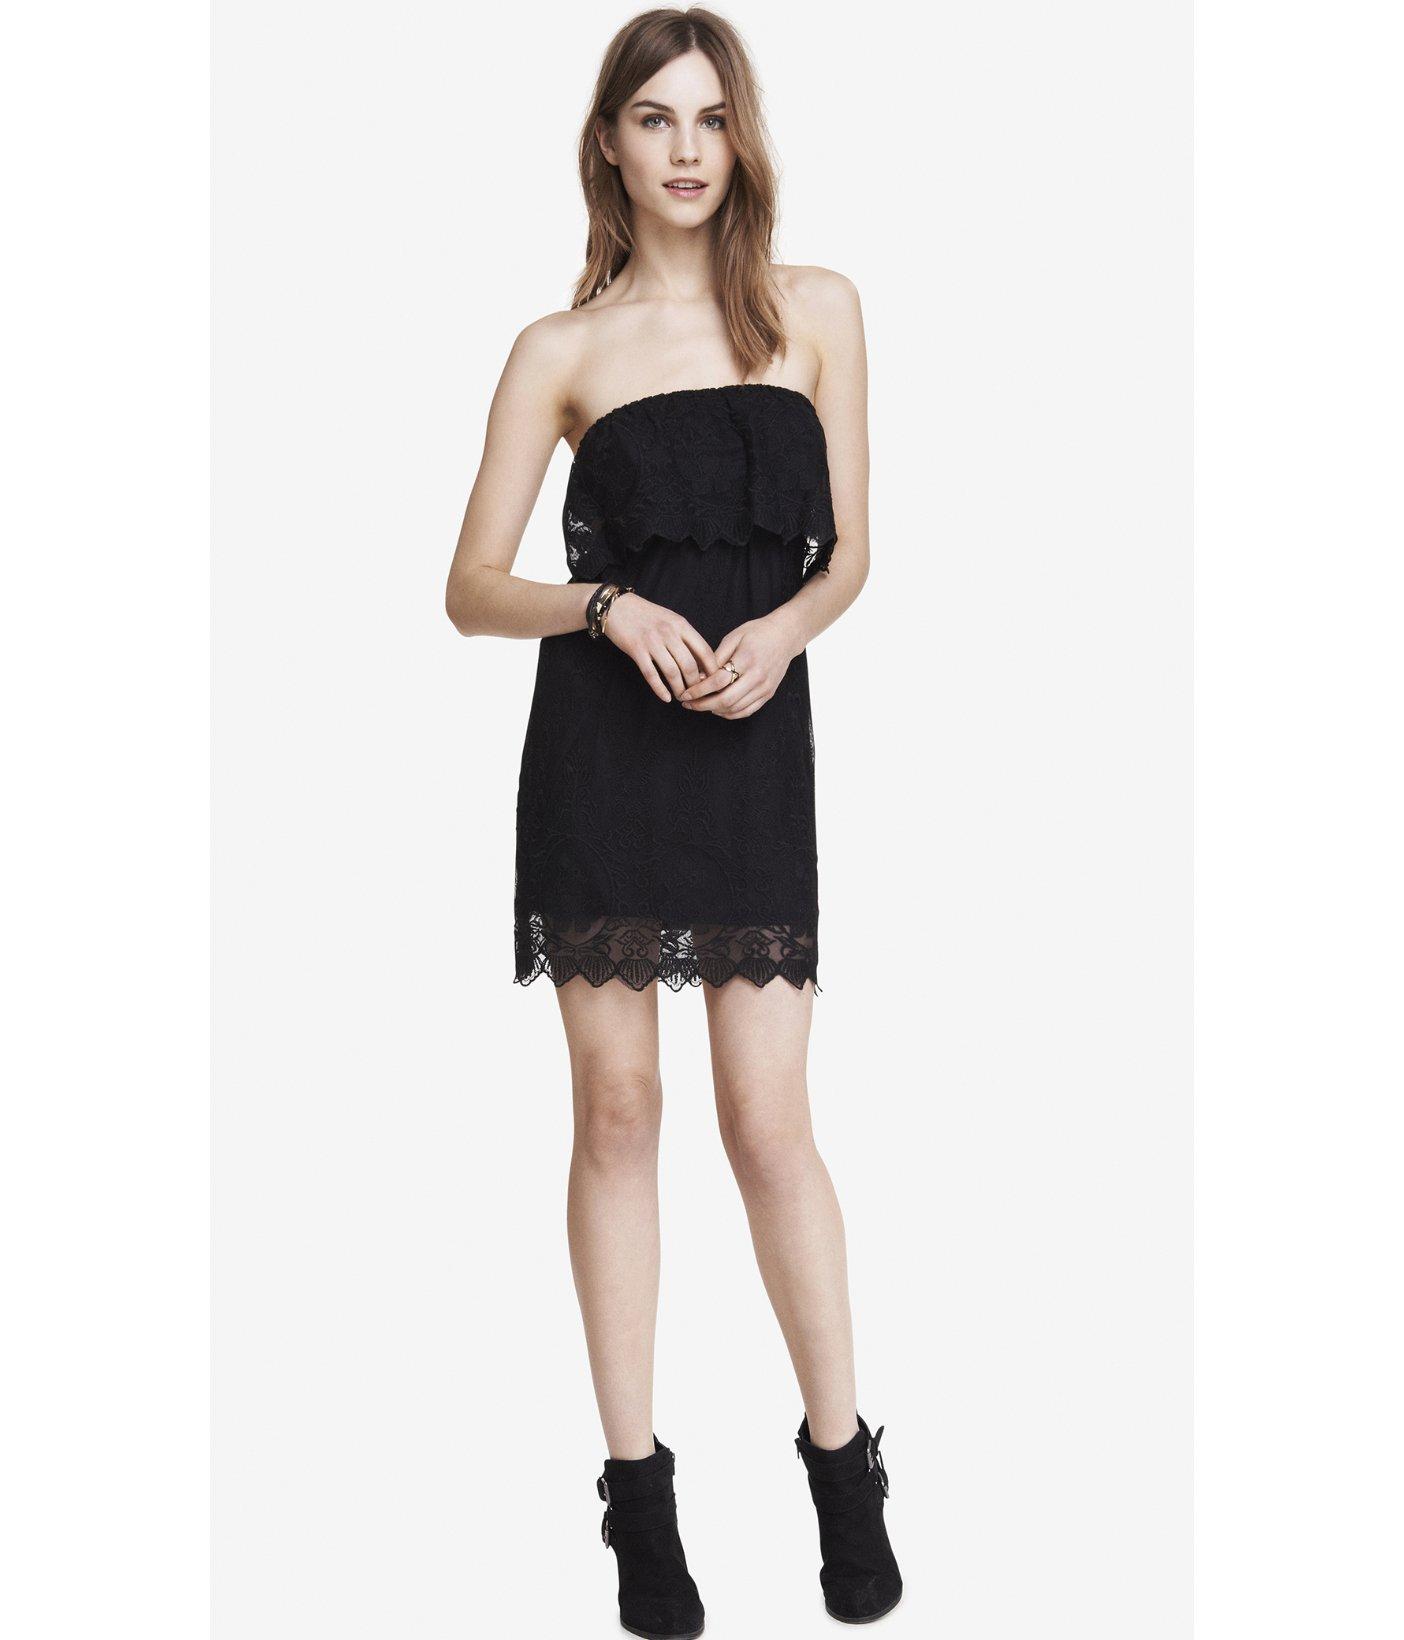 Buy Black little tube dress picture trends